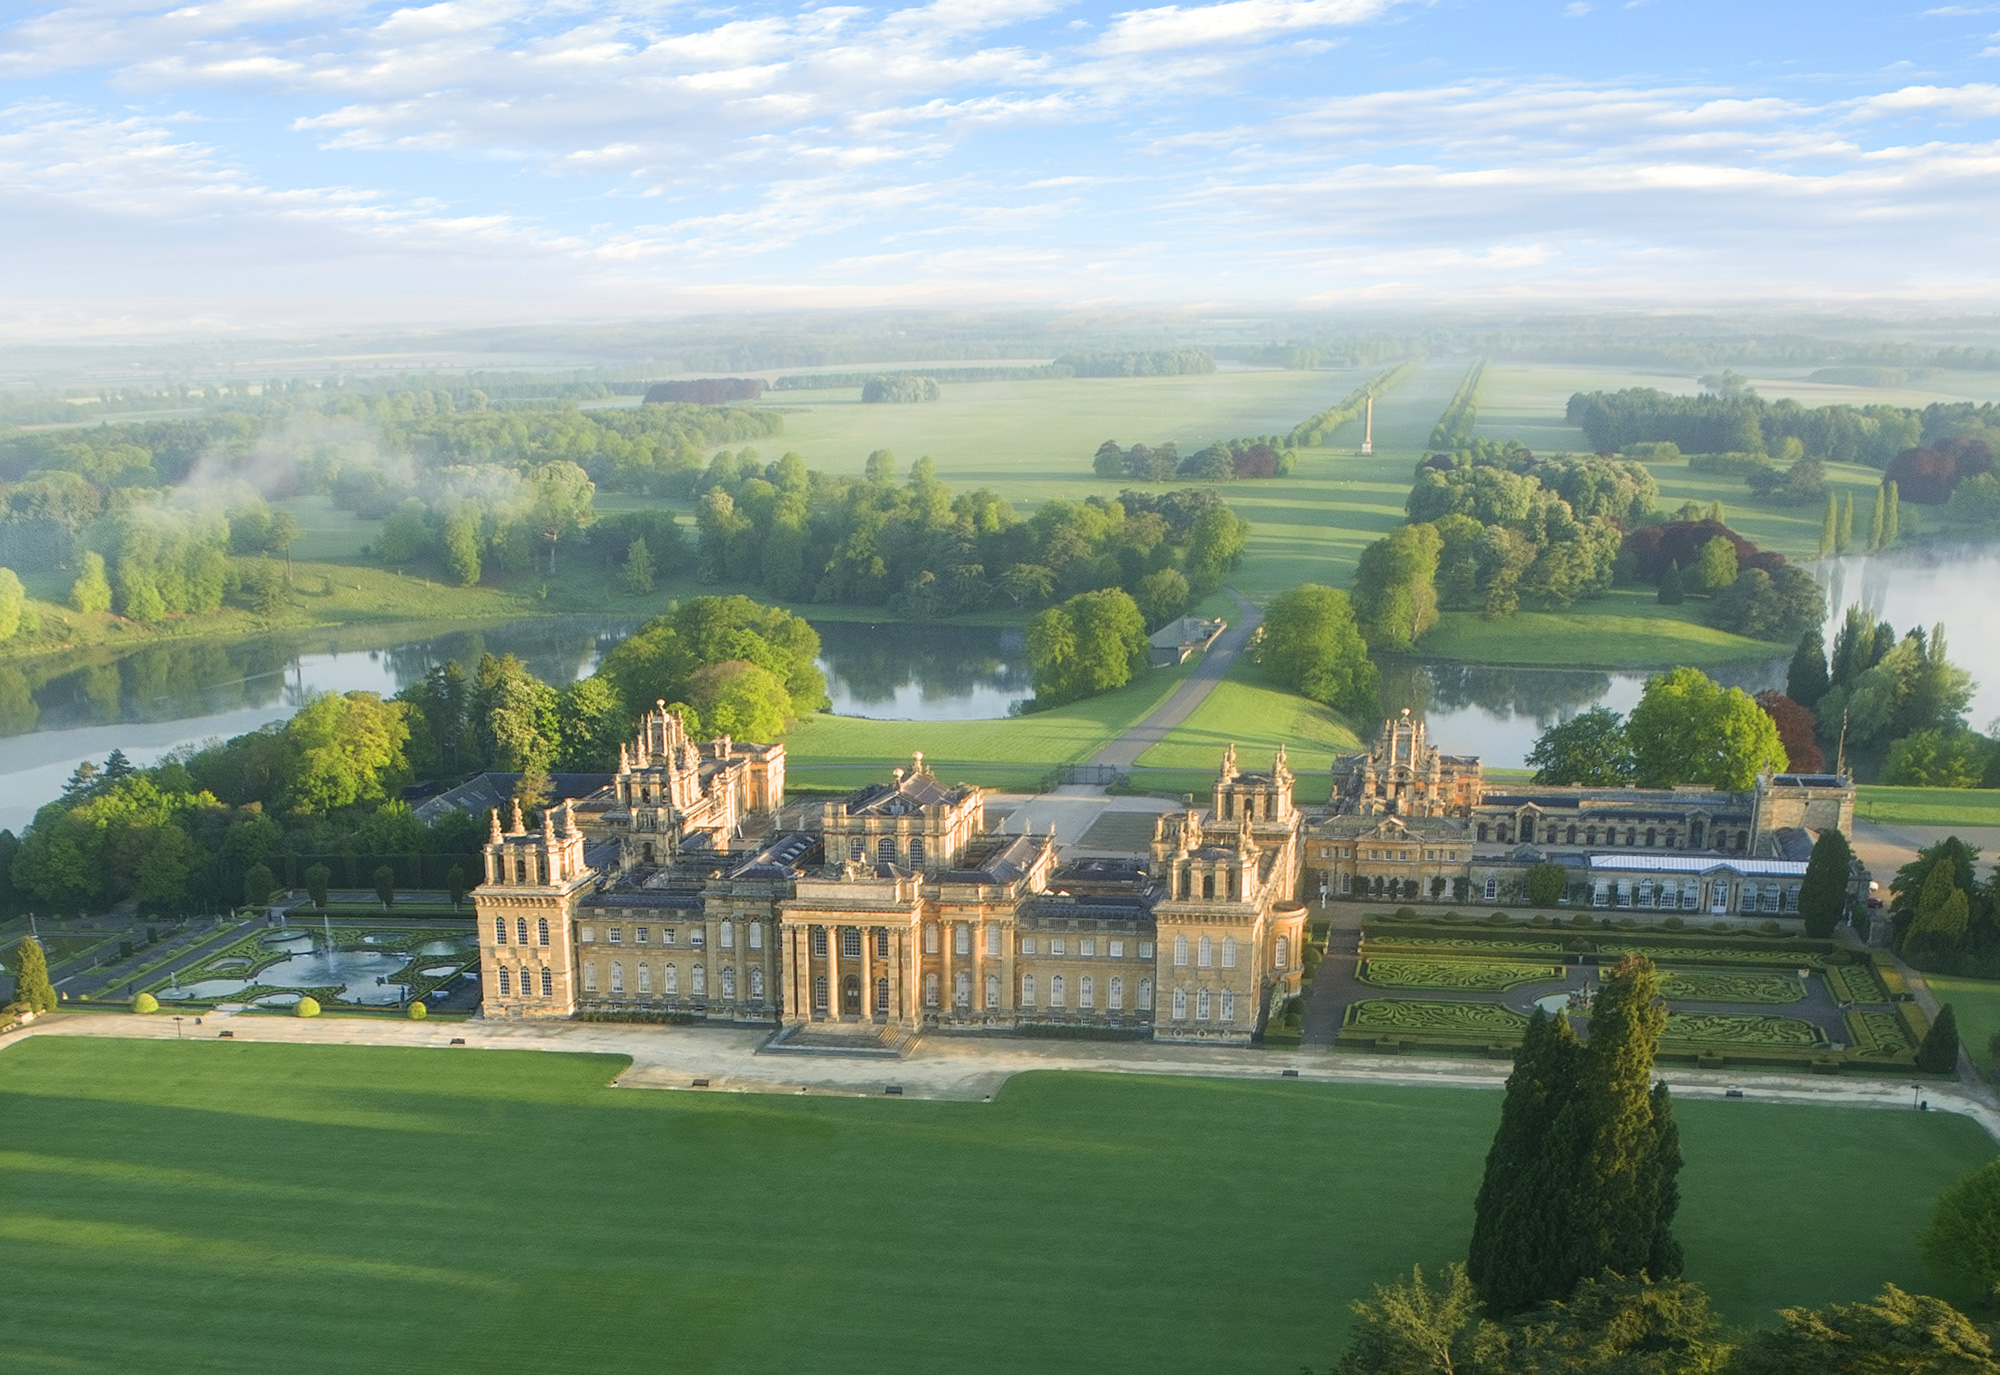 Dick-Lovett-Swindon-BlenheimPalace-Park-And-Gardens-South-Aerial-Lawn.jpg